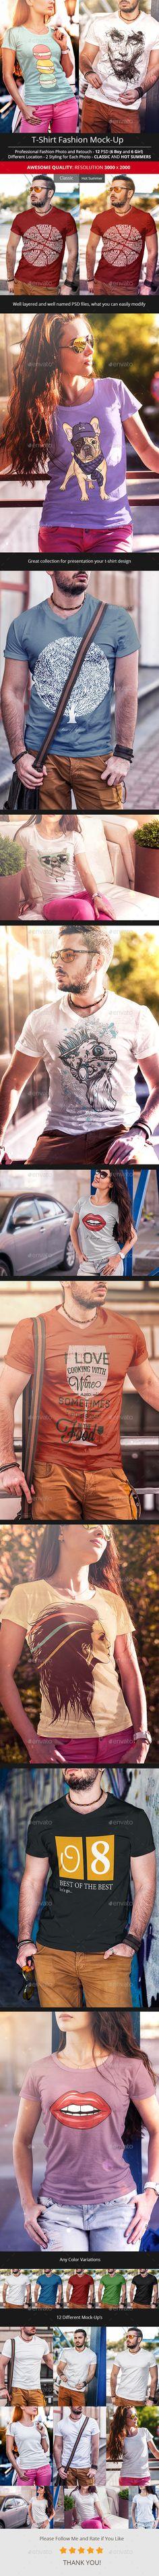 T-Shirt Fashion Mock-Up - T-shirts Apparel #mockup #designdisplay - Realistic design display men and women